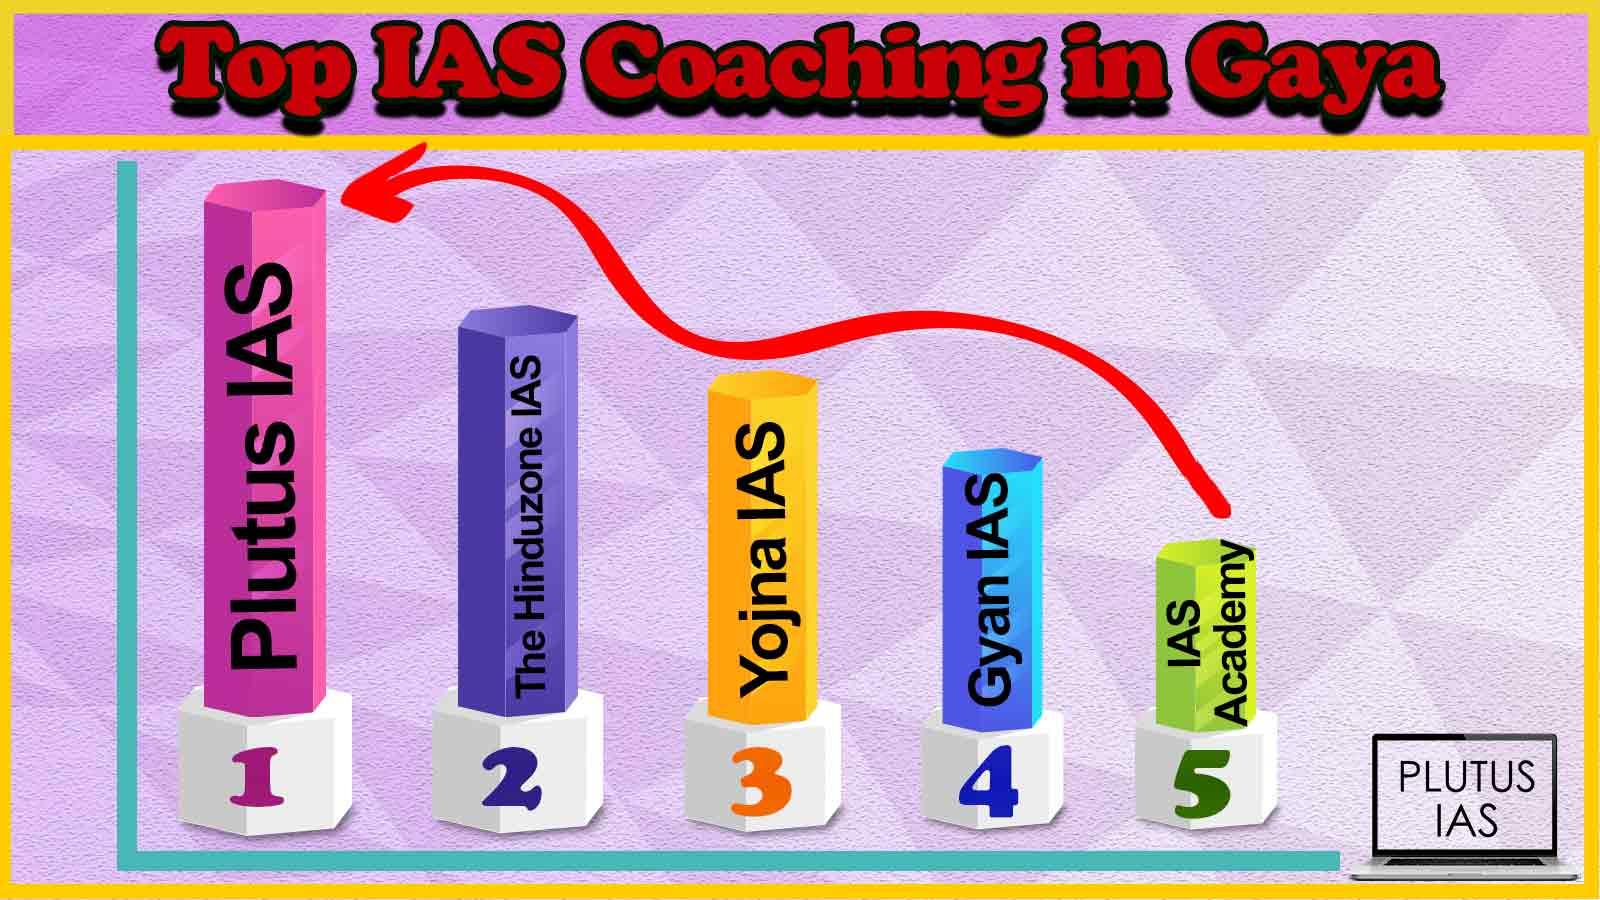 Best 10 IAS Coaching in Gaya